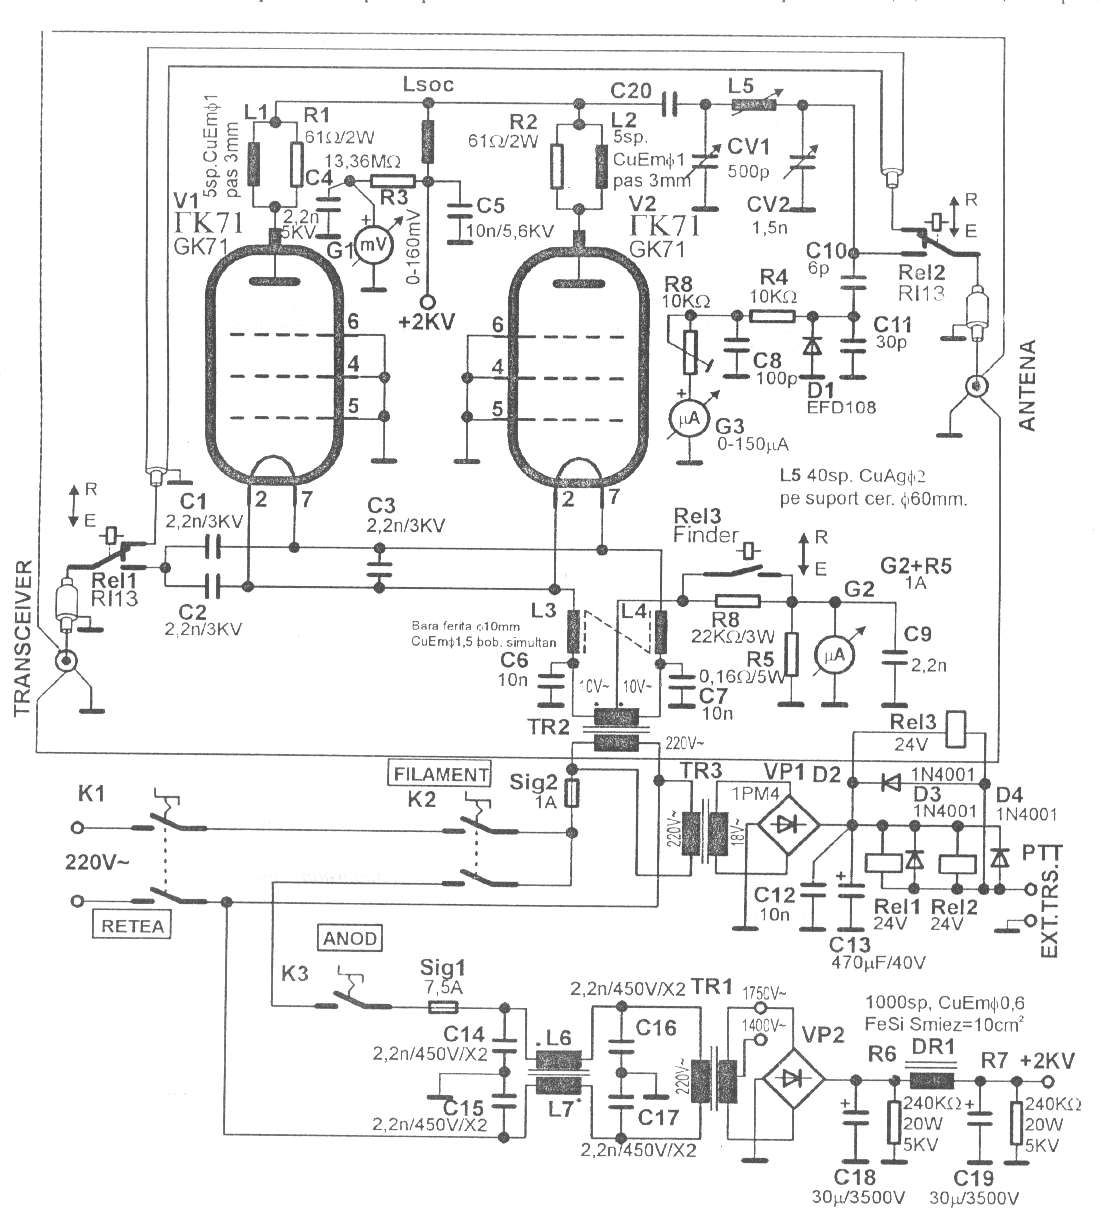 Index Of Eca Fail Lamp Fm Circuit Page 2 Rf Circuits Nextgr Qro Gk71 128k